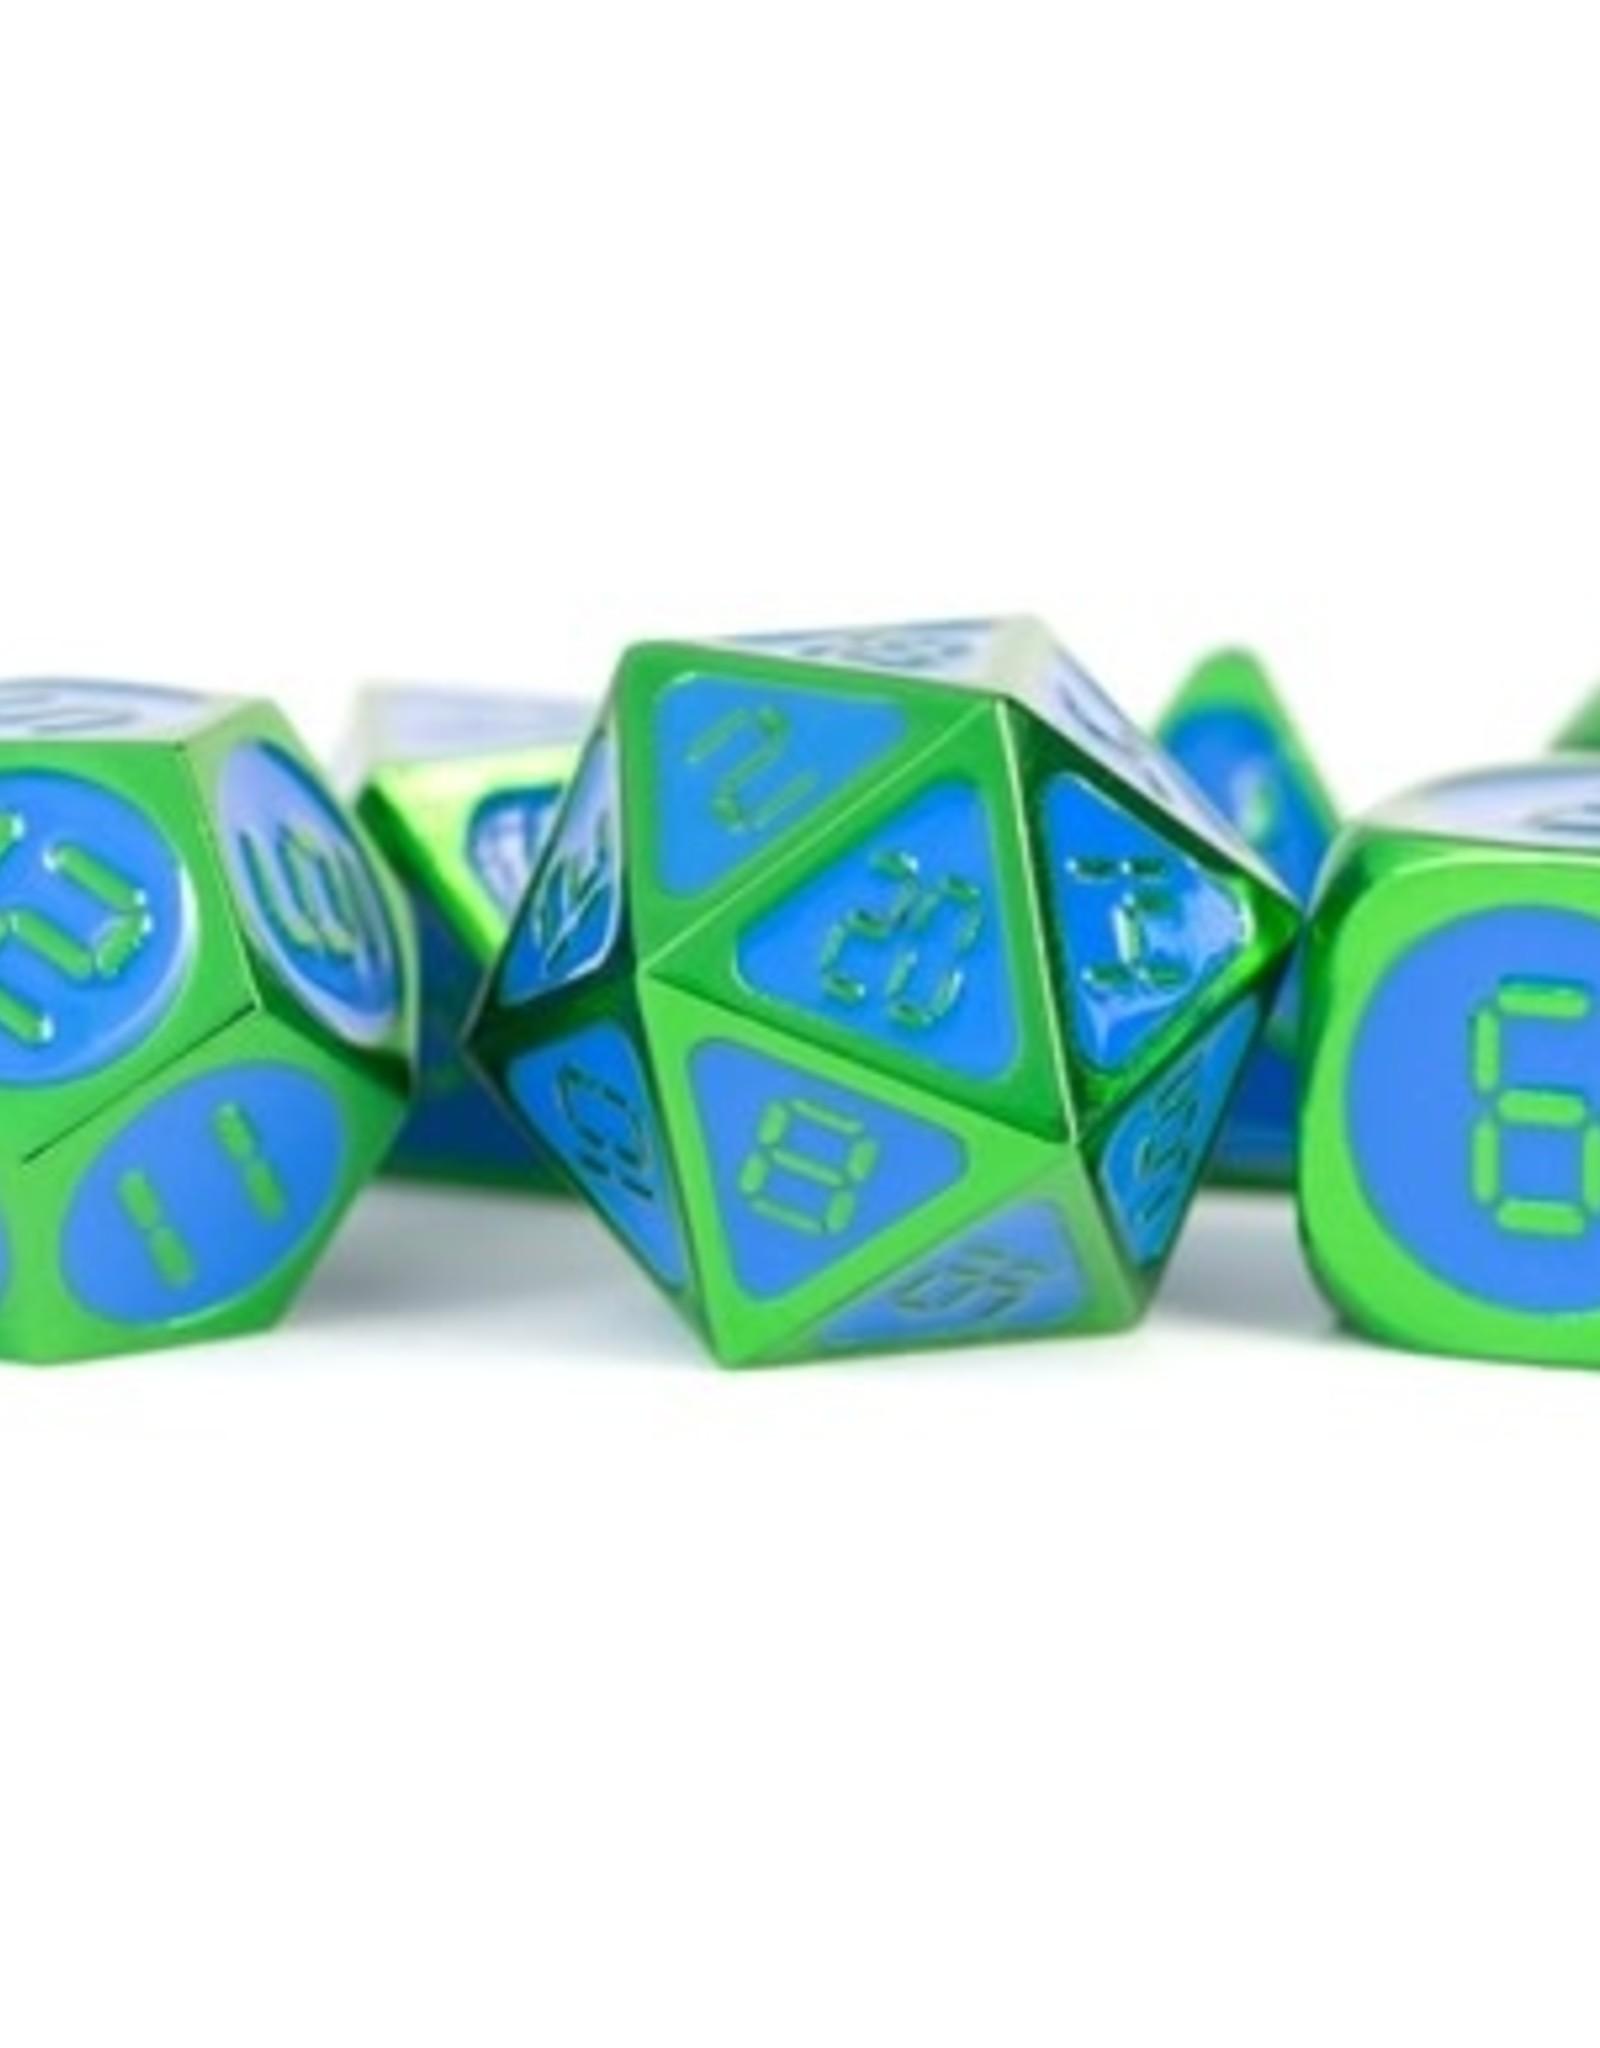 Metallic Dice Games Poly Dice Set Digital Green w/ Blue Enamel